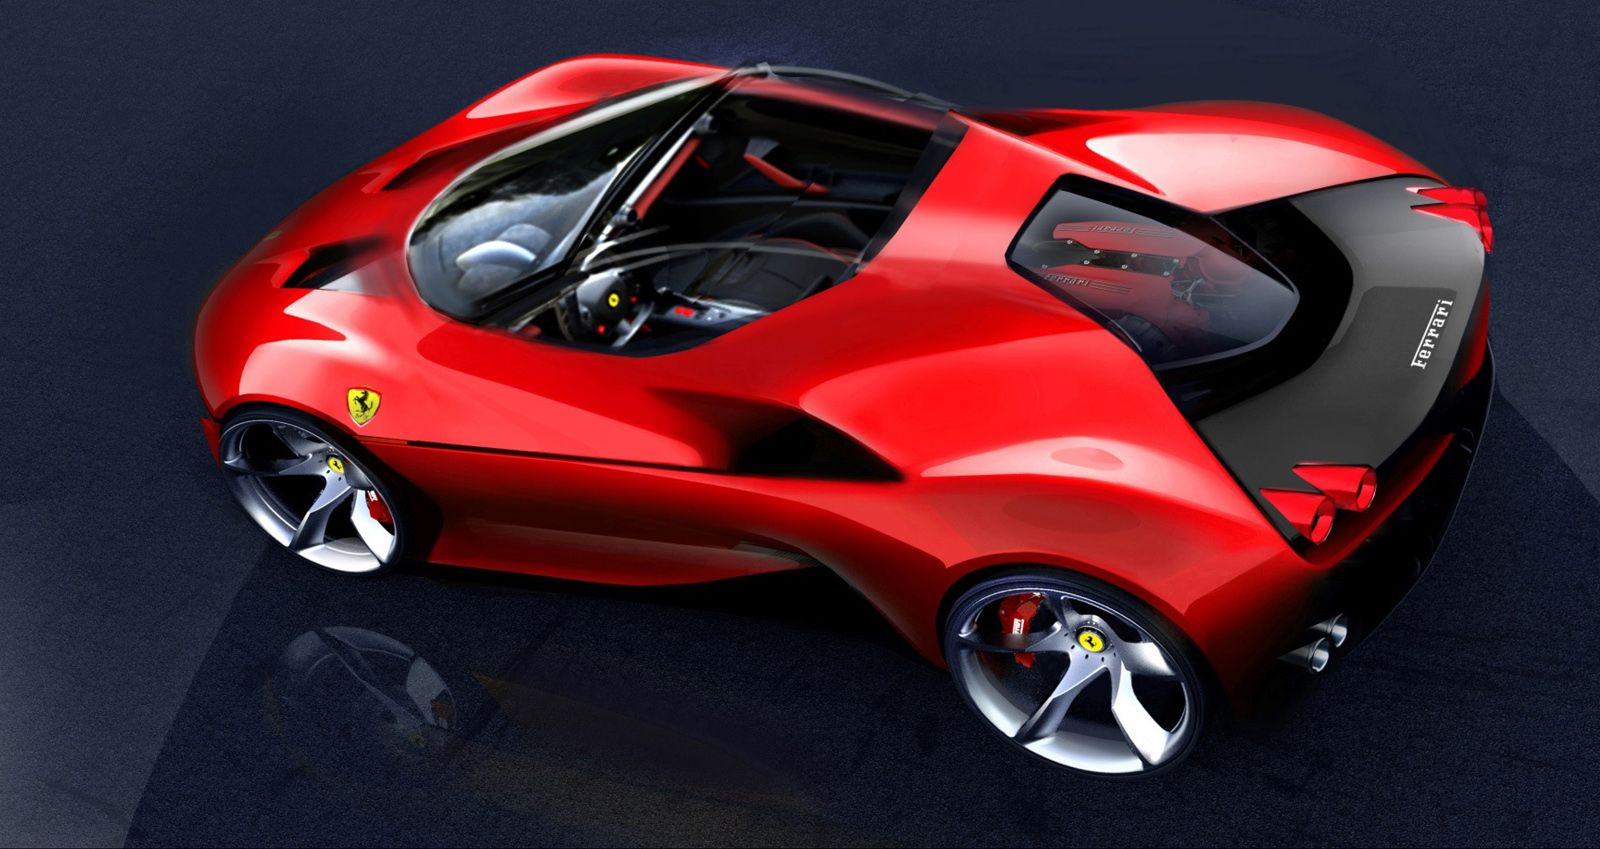 Ferrari S Future Designs Could Follow J50 S Lead Carscoops Ferrari Car Super Cars Ferrari